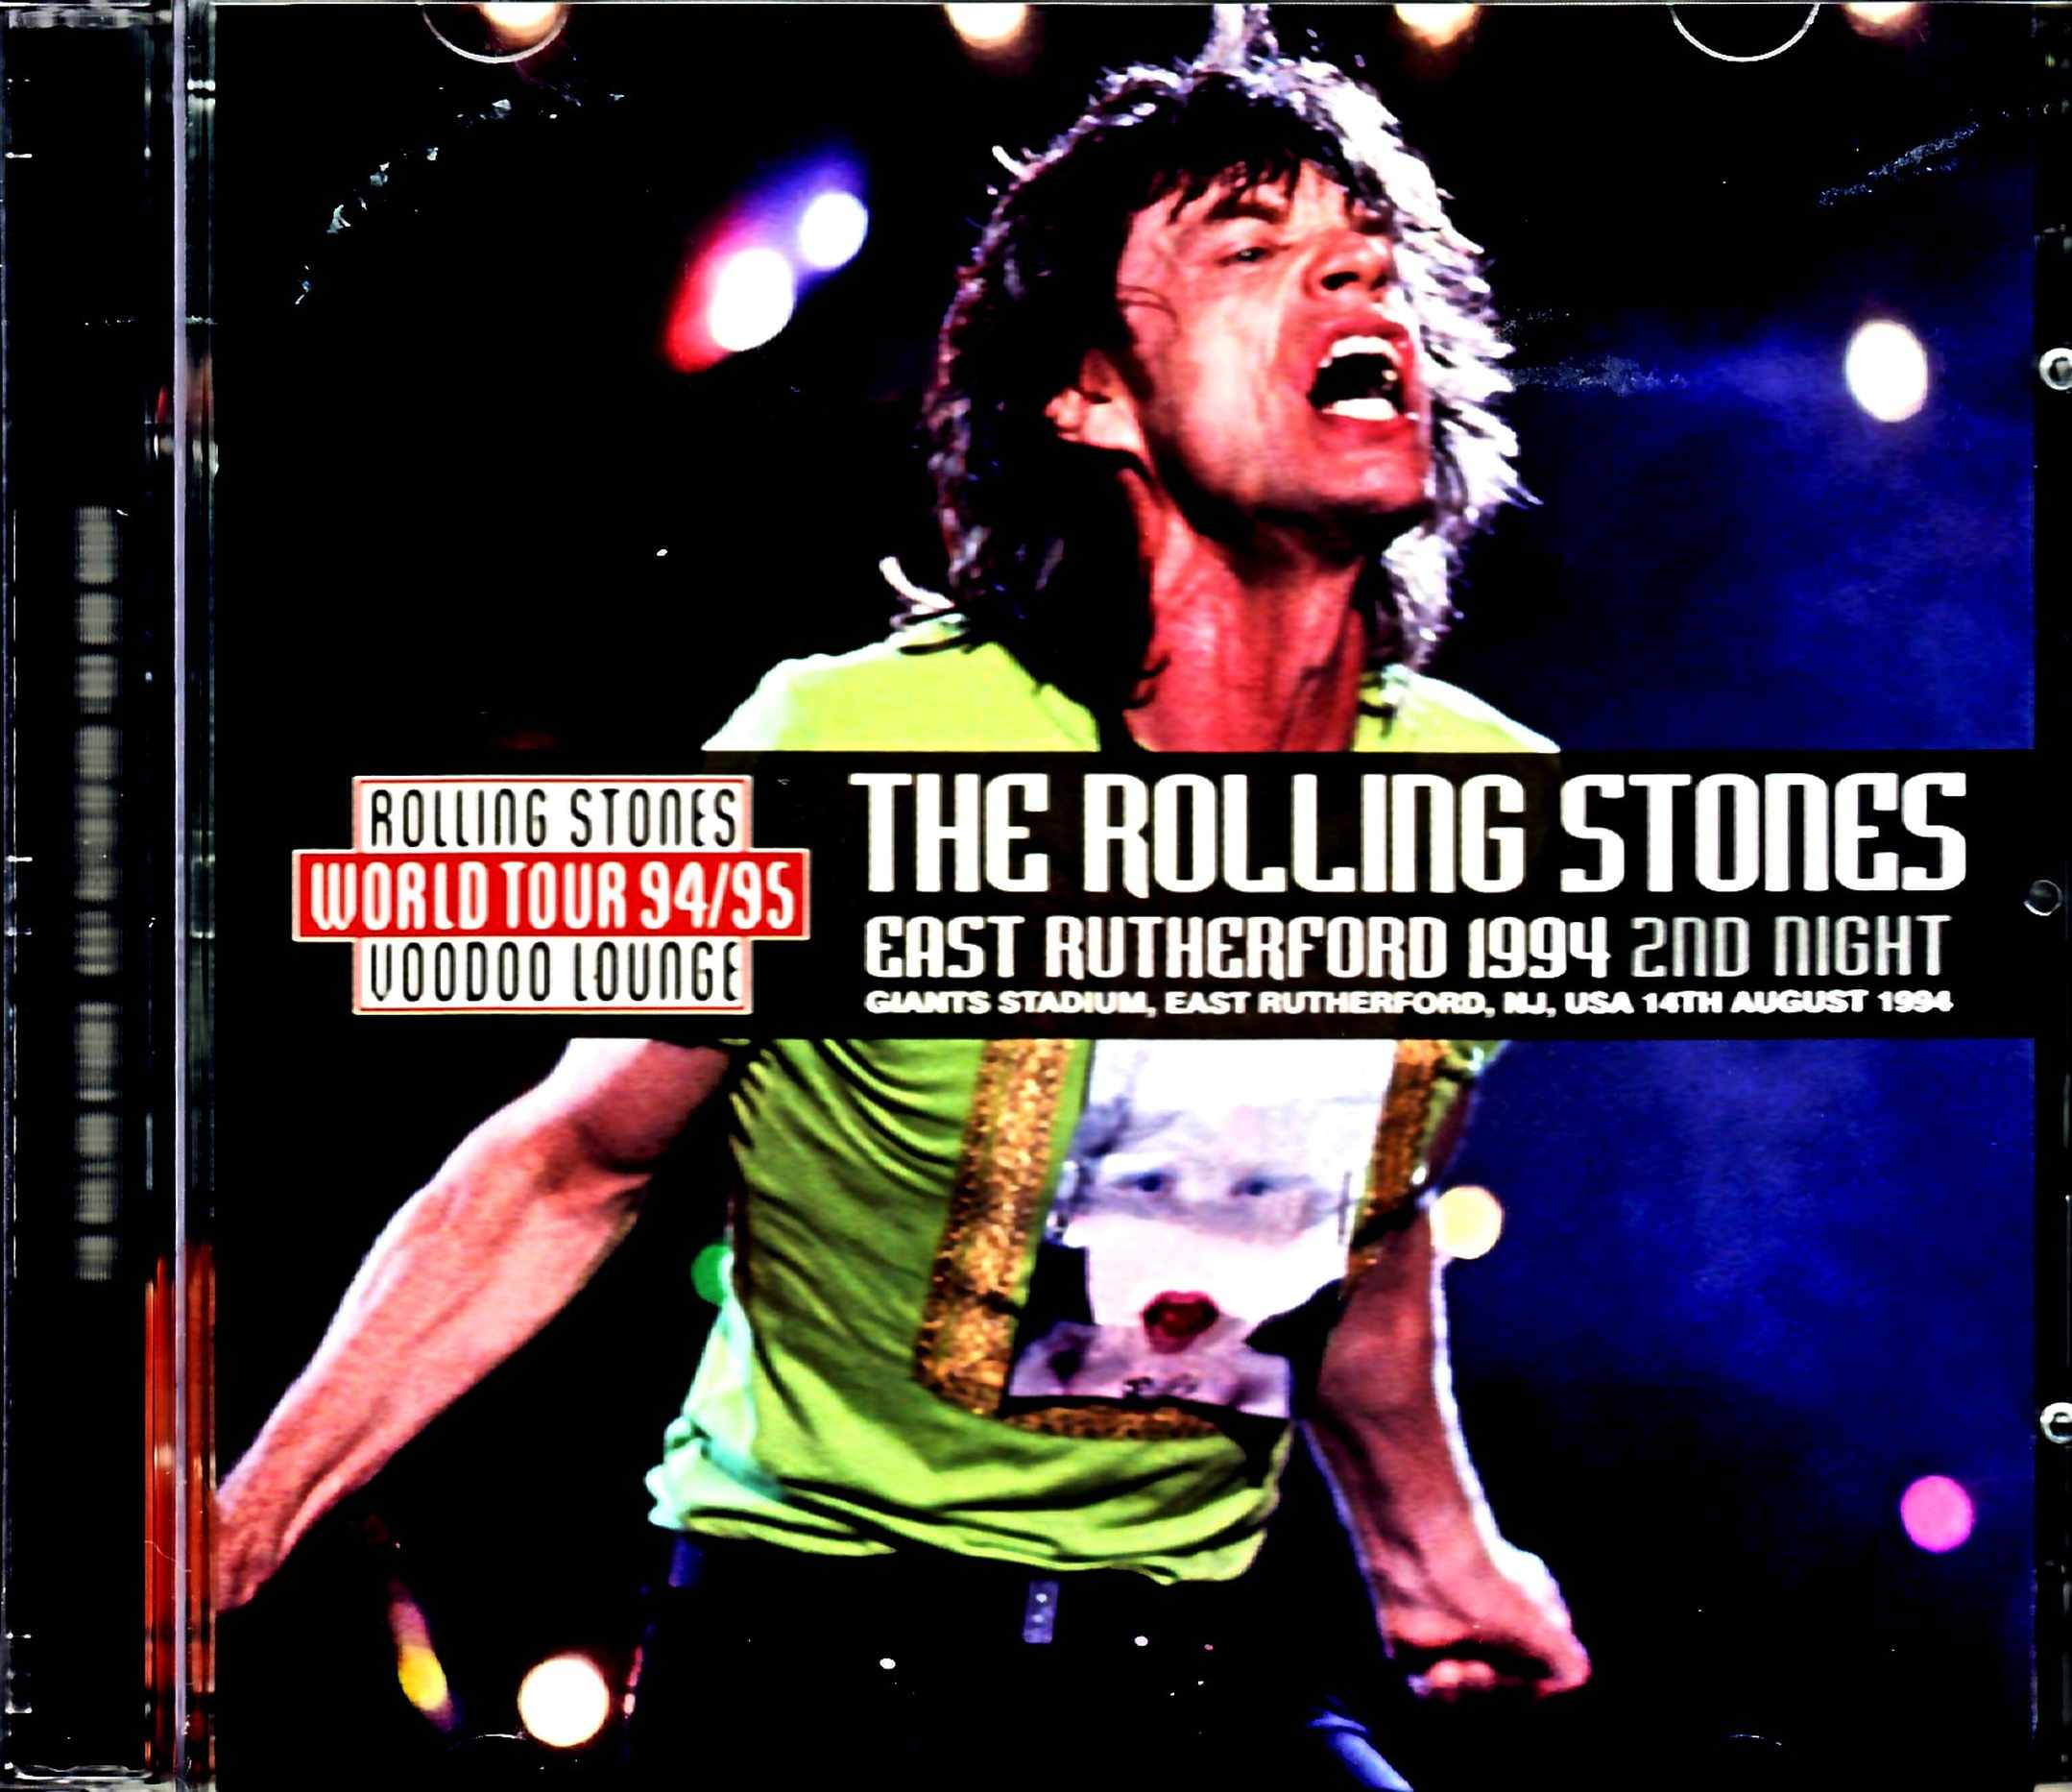 Rolling Stones ローリング・ストーンズ/NJ,USA 8.14.1994